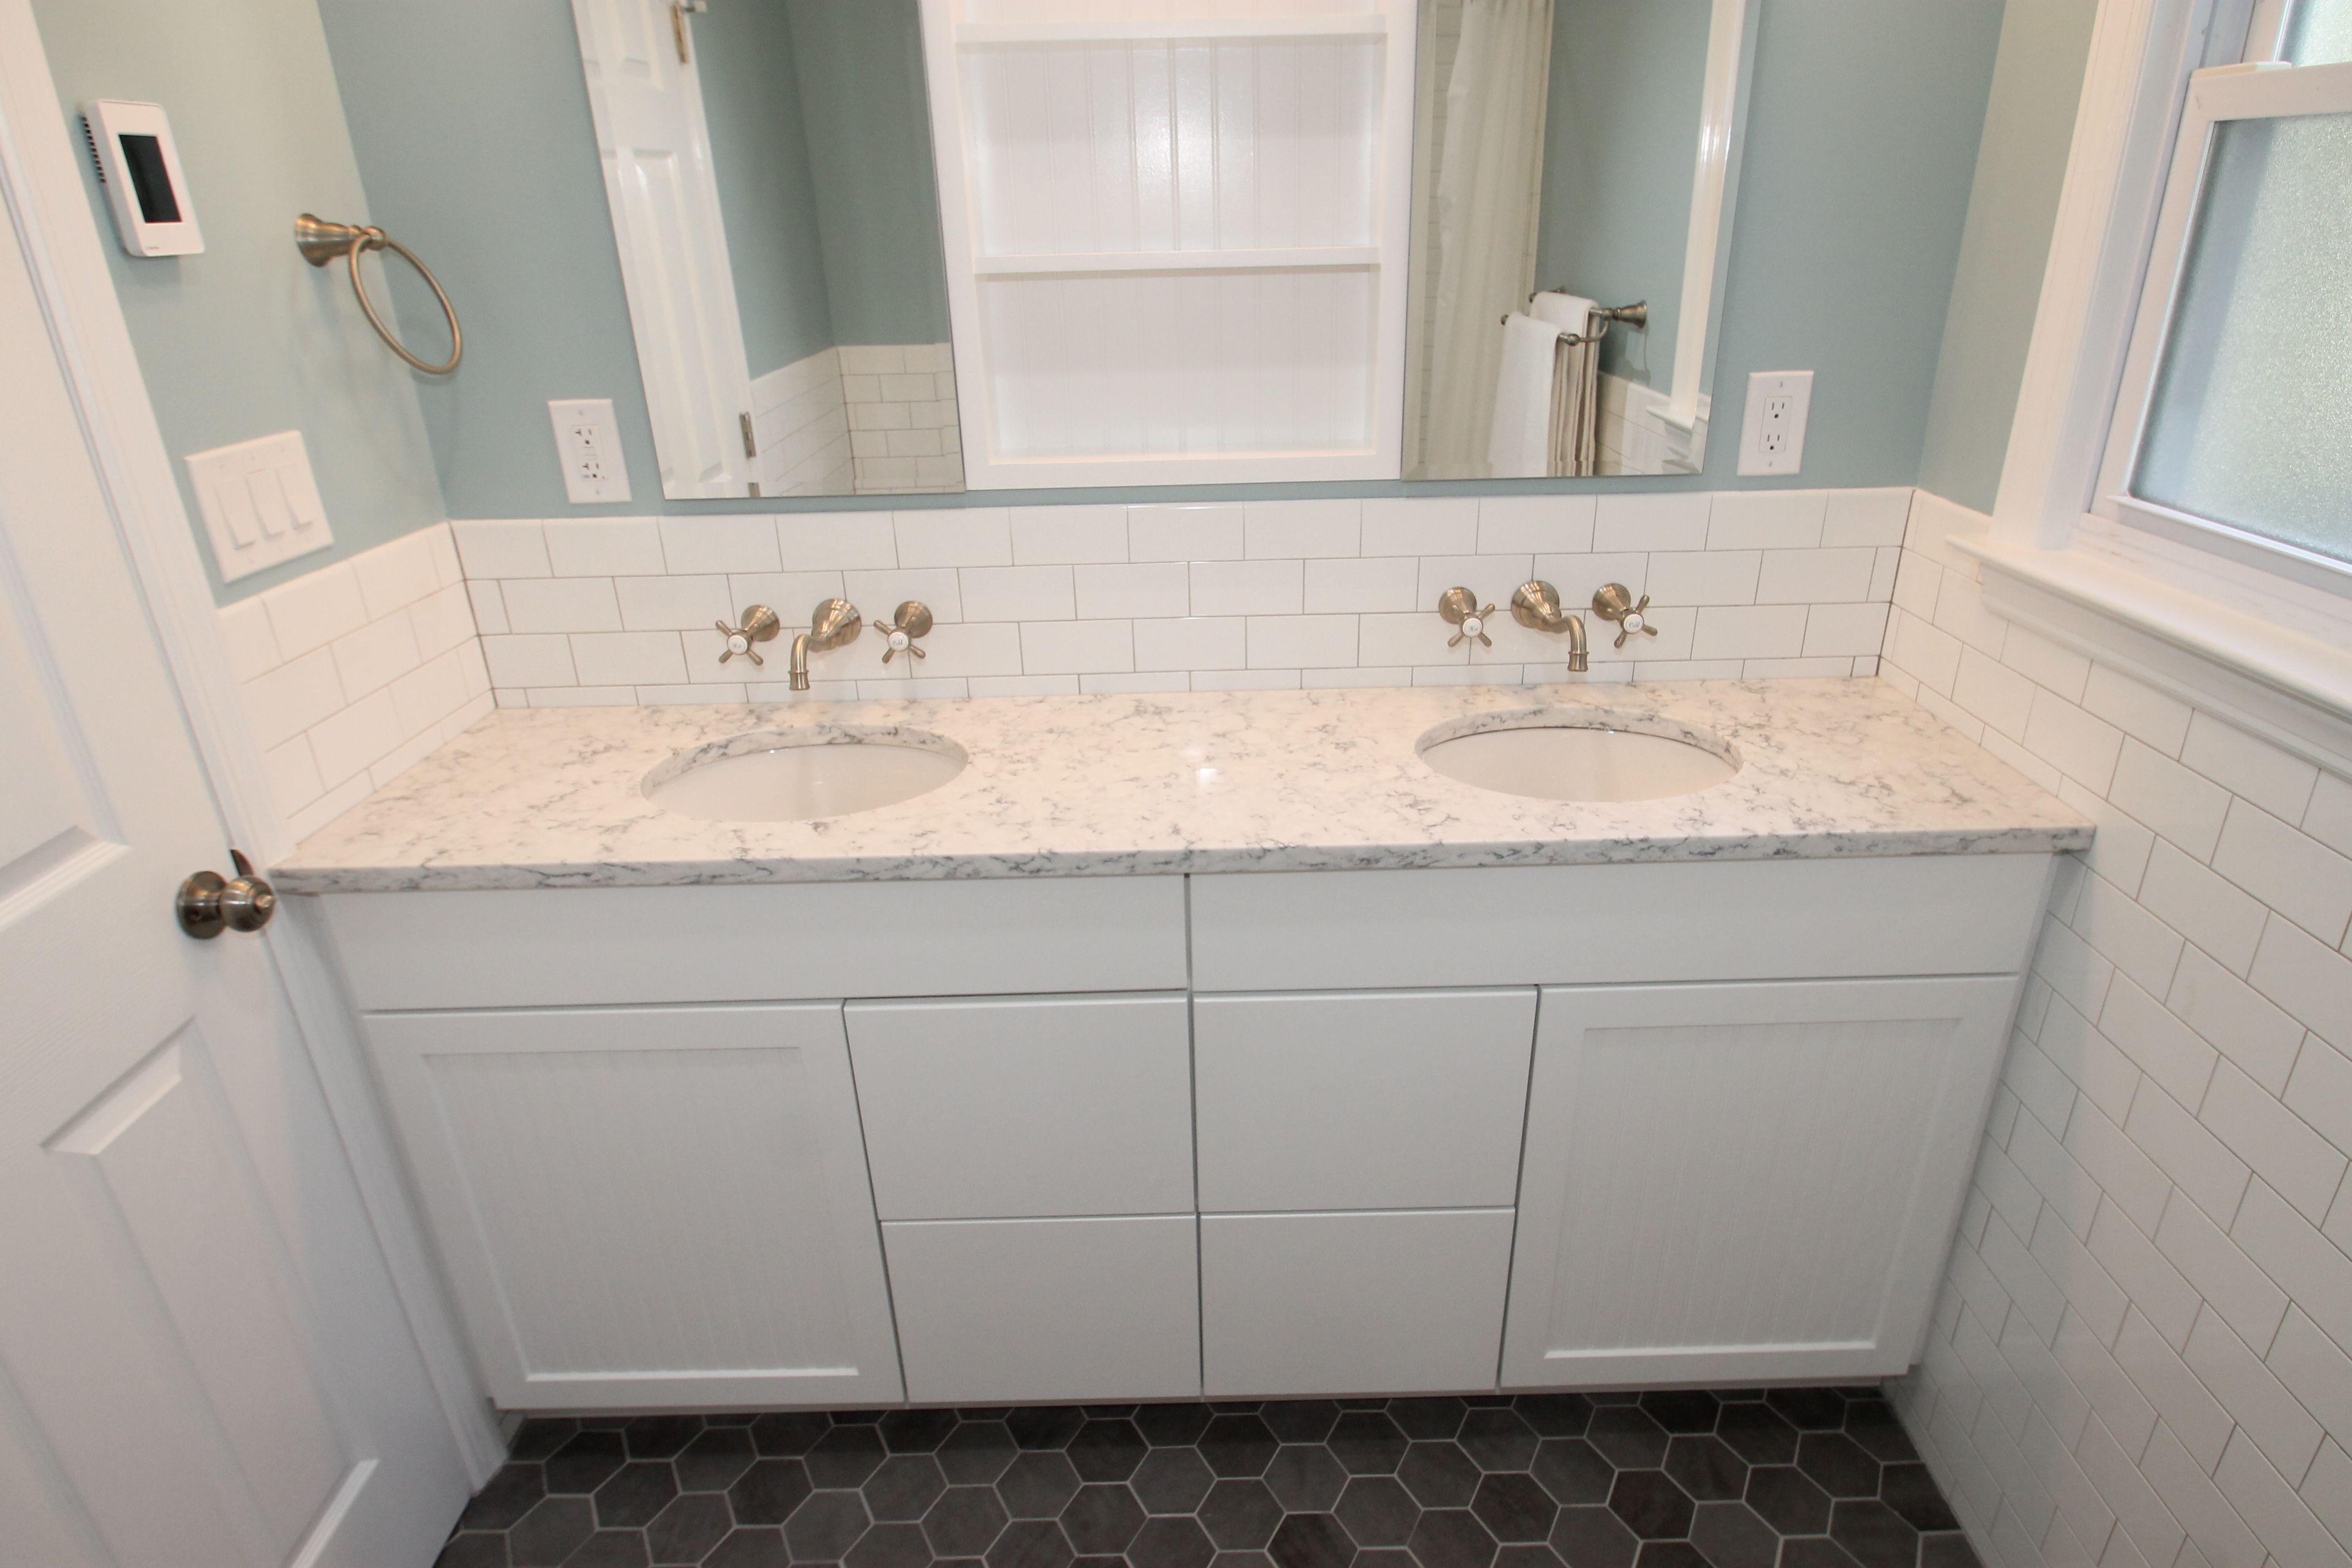 A classic white bath remodel makes a small space inviting